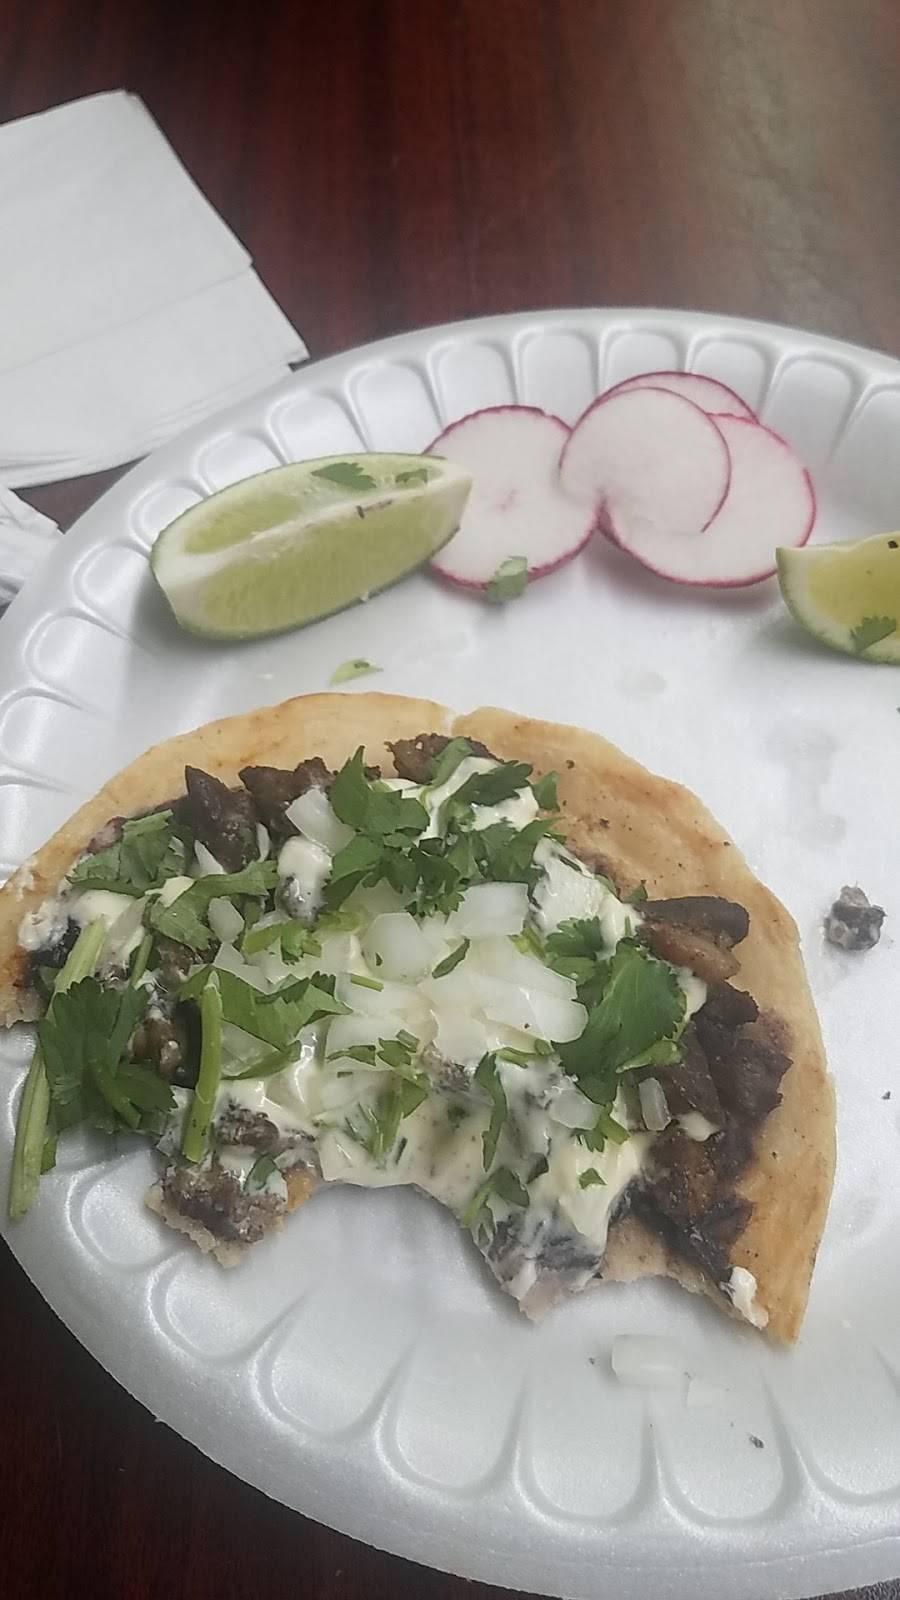 Las Chatas | restaurant | 599 E 184th St, Bronx, NY 10458, USA | 7183651207 OR +1 718-365-1207